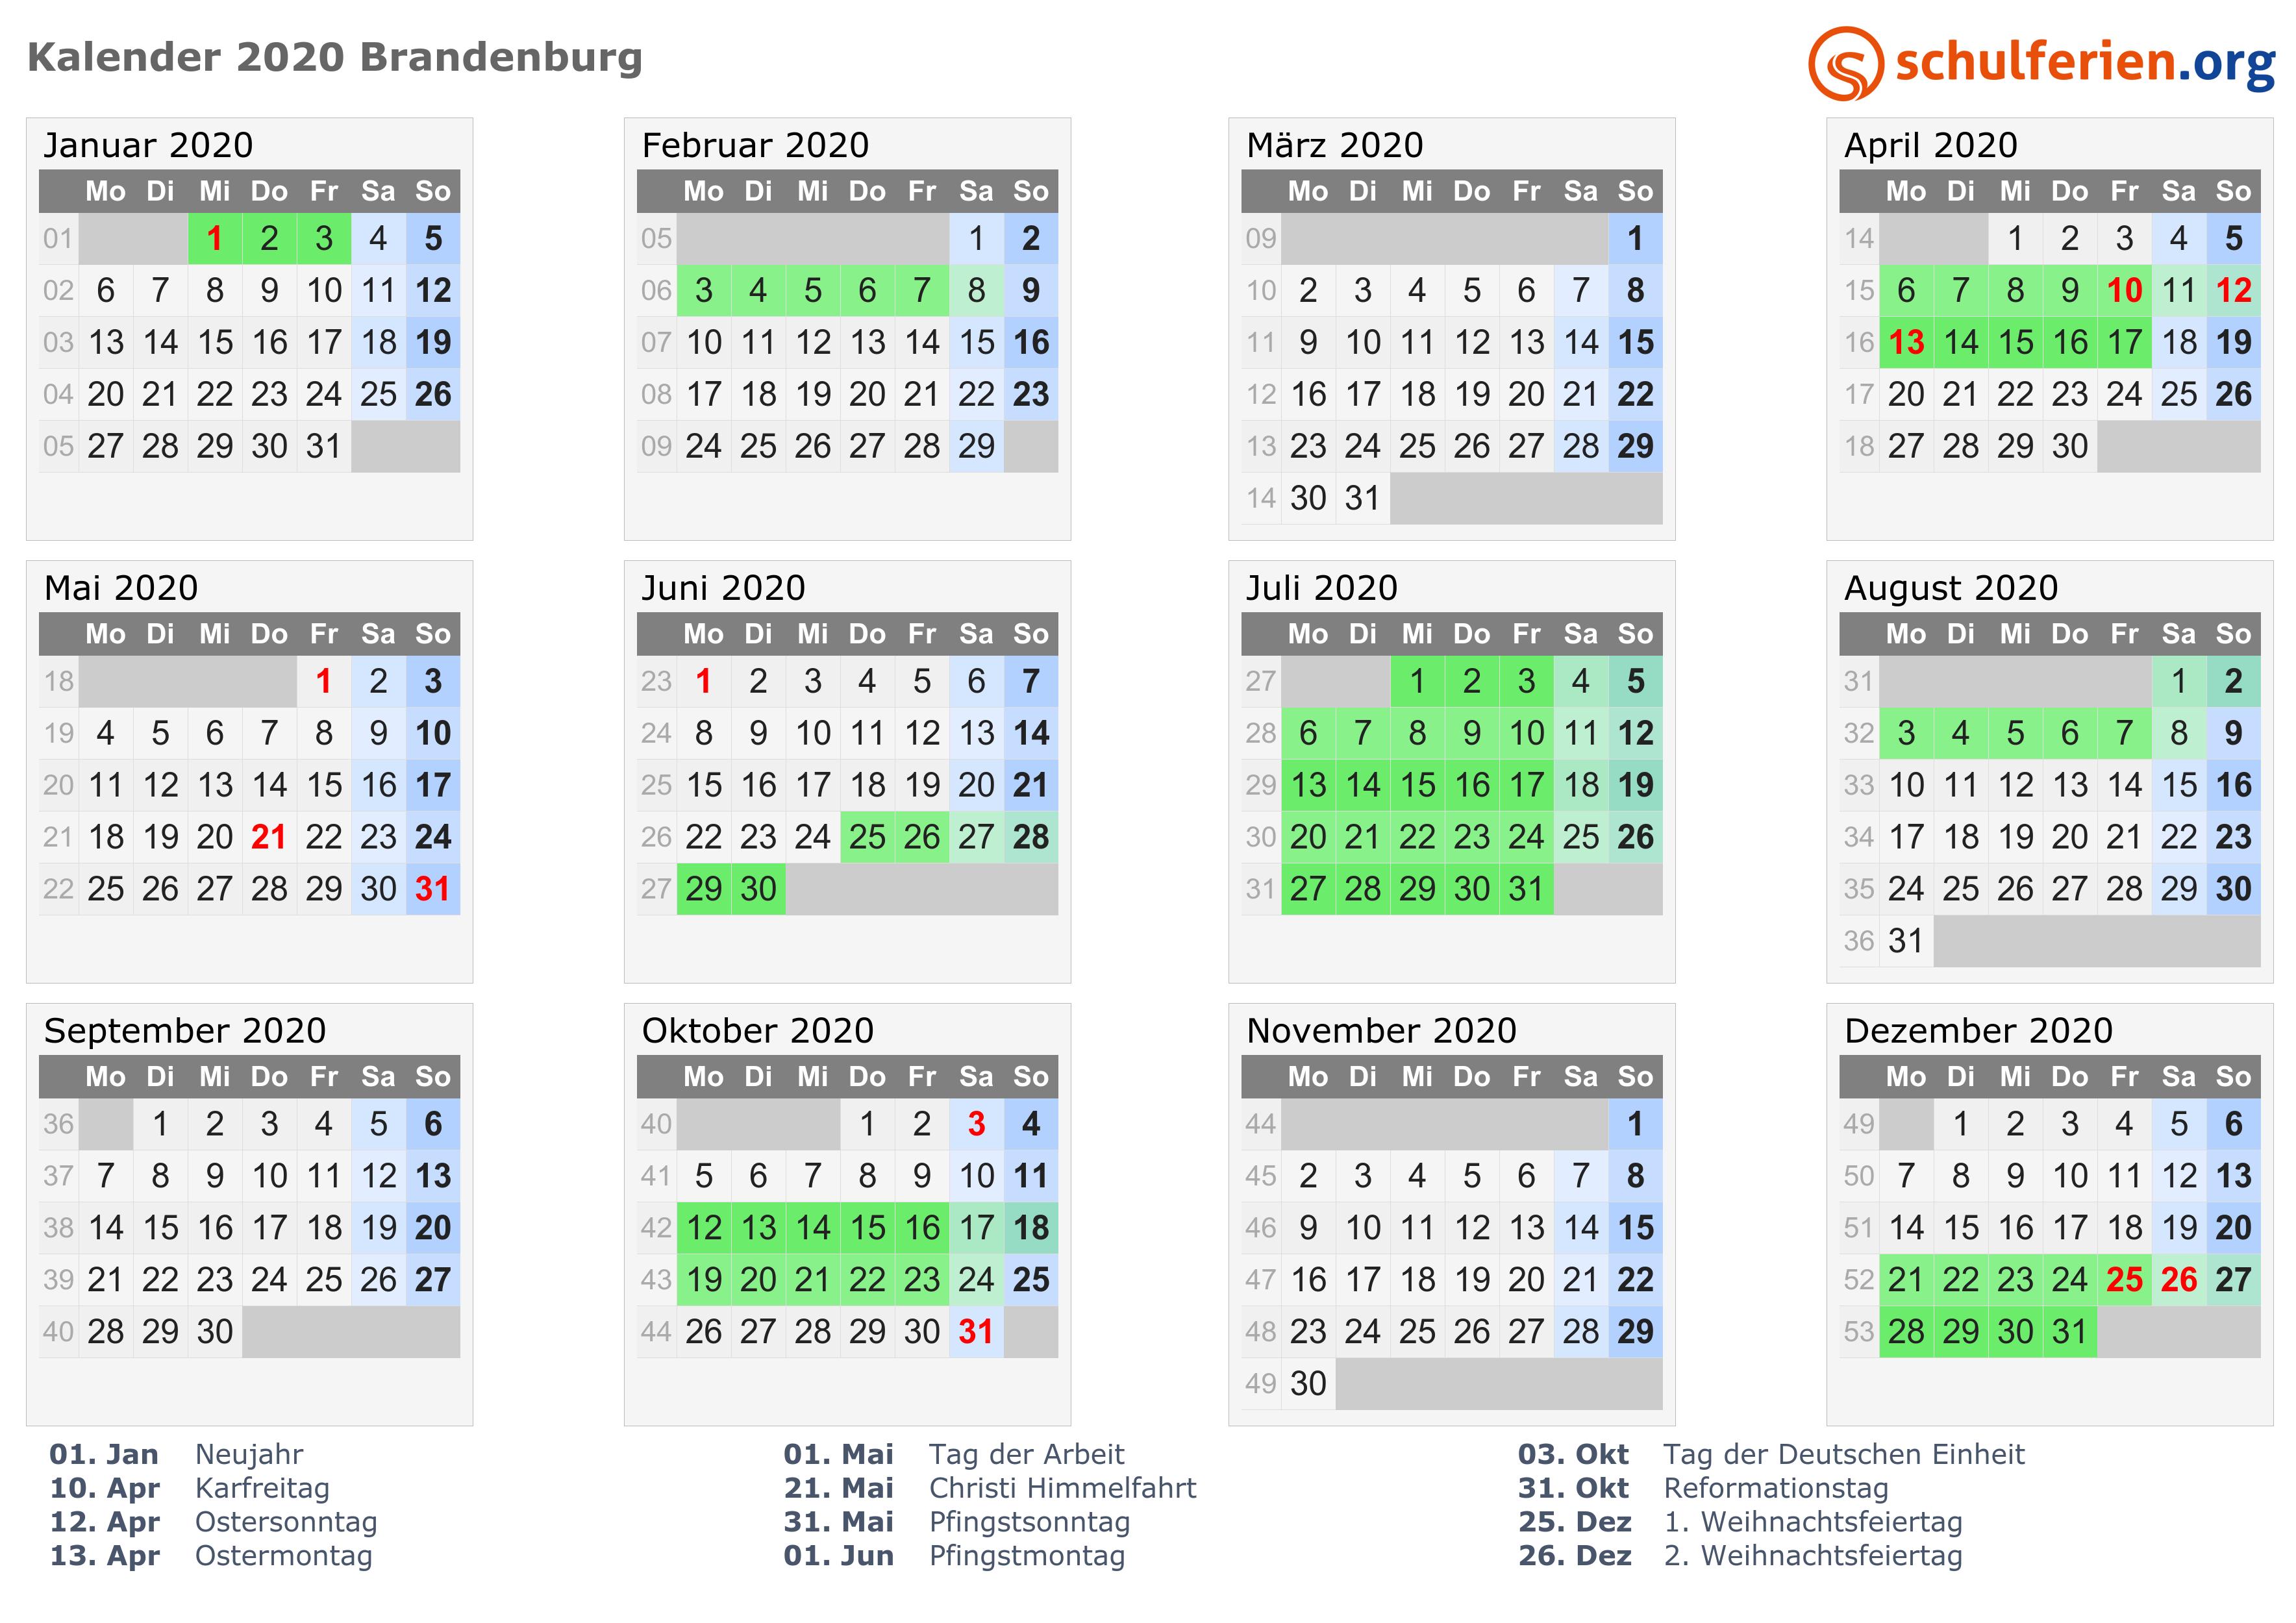 kalender 2020 ferien brandenburg feiertage. Black Bedroom Furniture Sets. Home Design Ideas